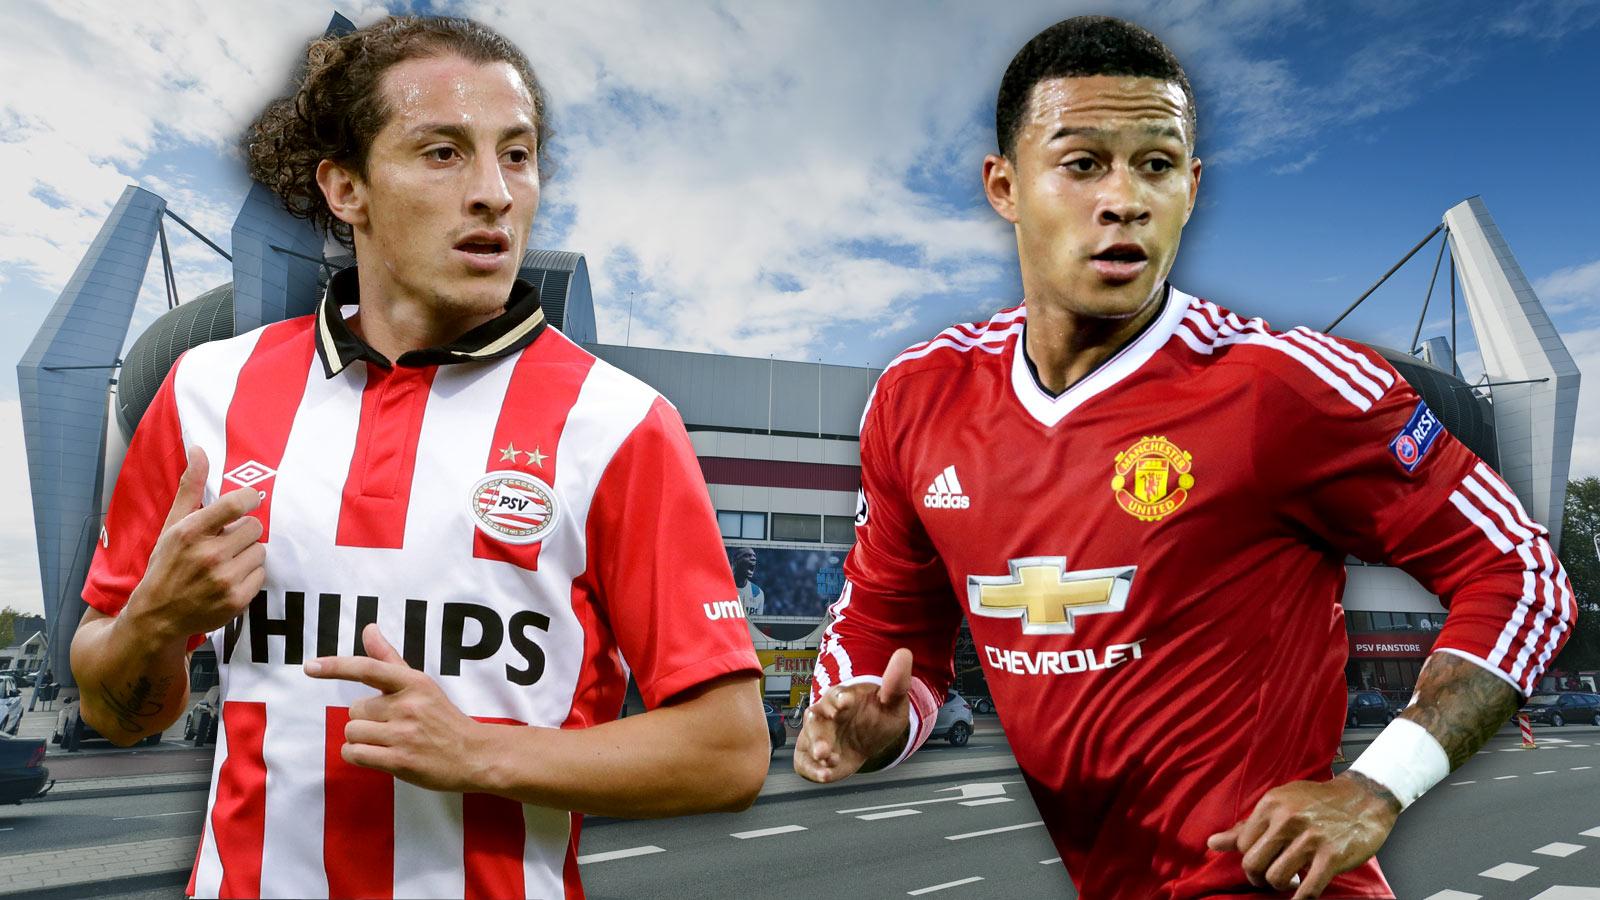 PSV test offers chance to assess United's progress under van Gaal